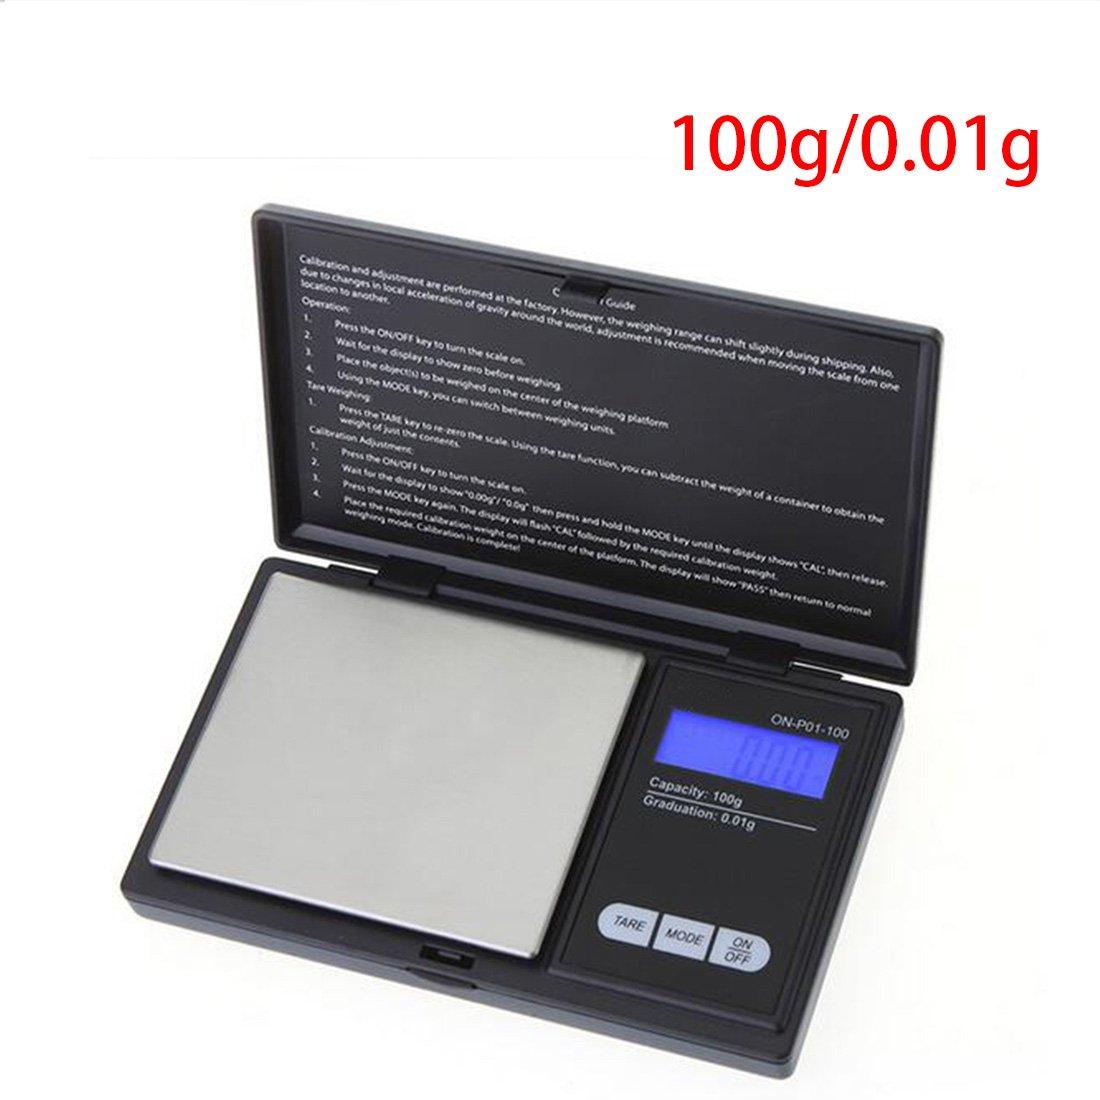 100 G/0.01g Mini Digital escala joyas escala de precisión de bolsillo electrónico Escala LCD Clamshell, ligero y portátil, 2, 200g/0.01g: Amazon.es: Hogar